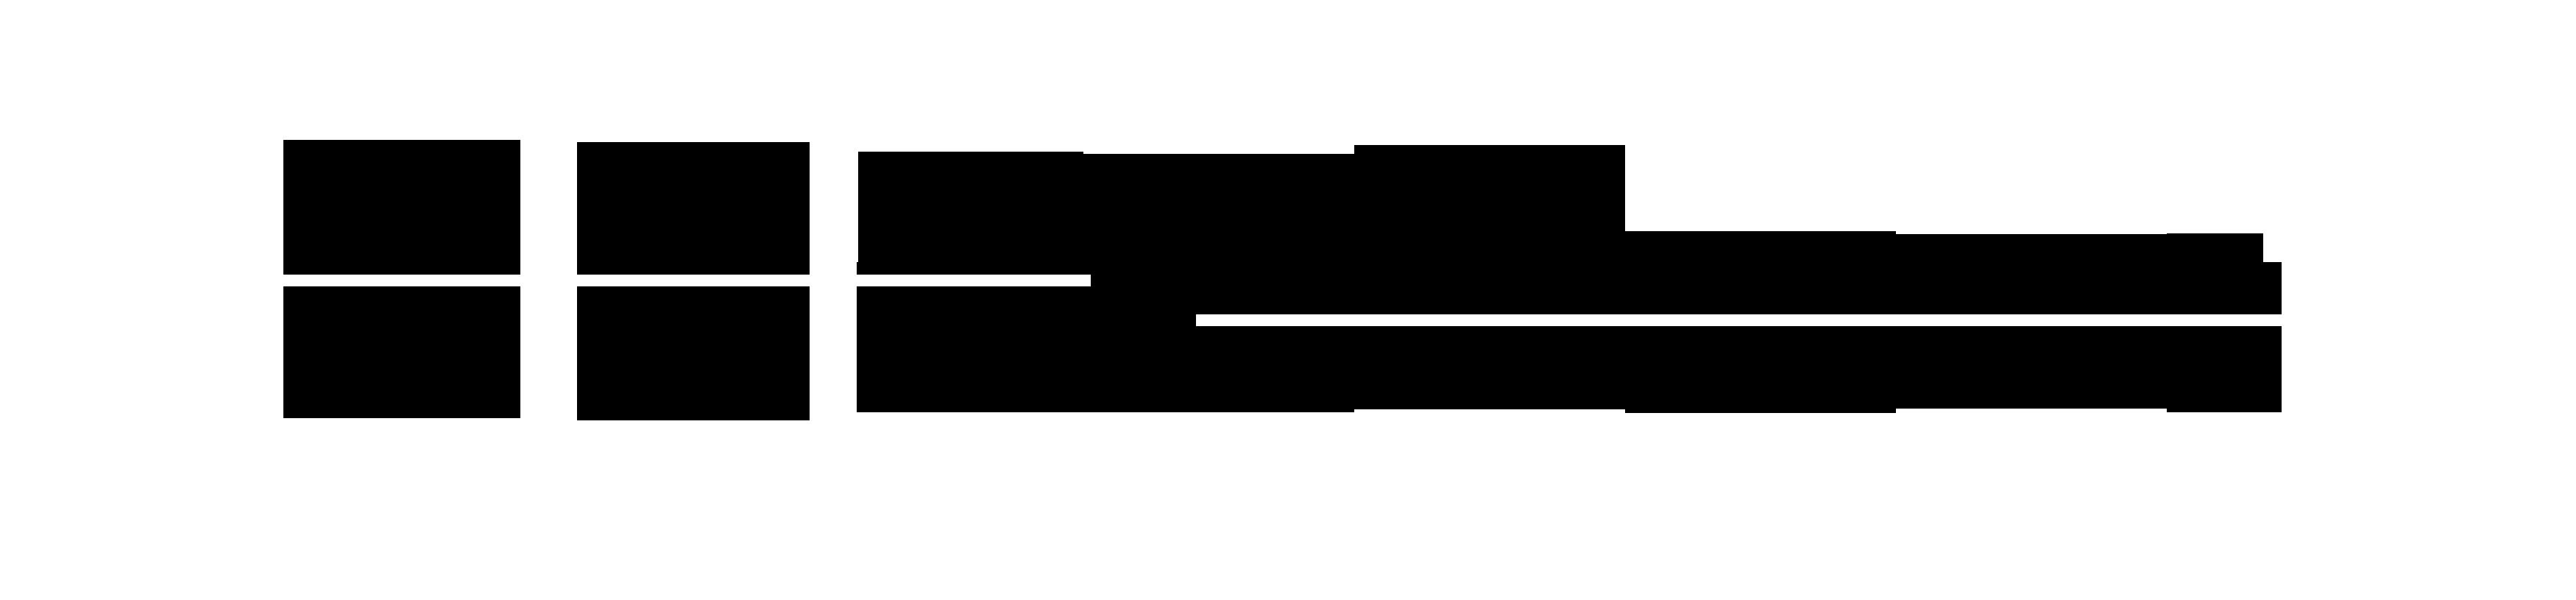 MNOchrome